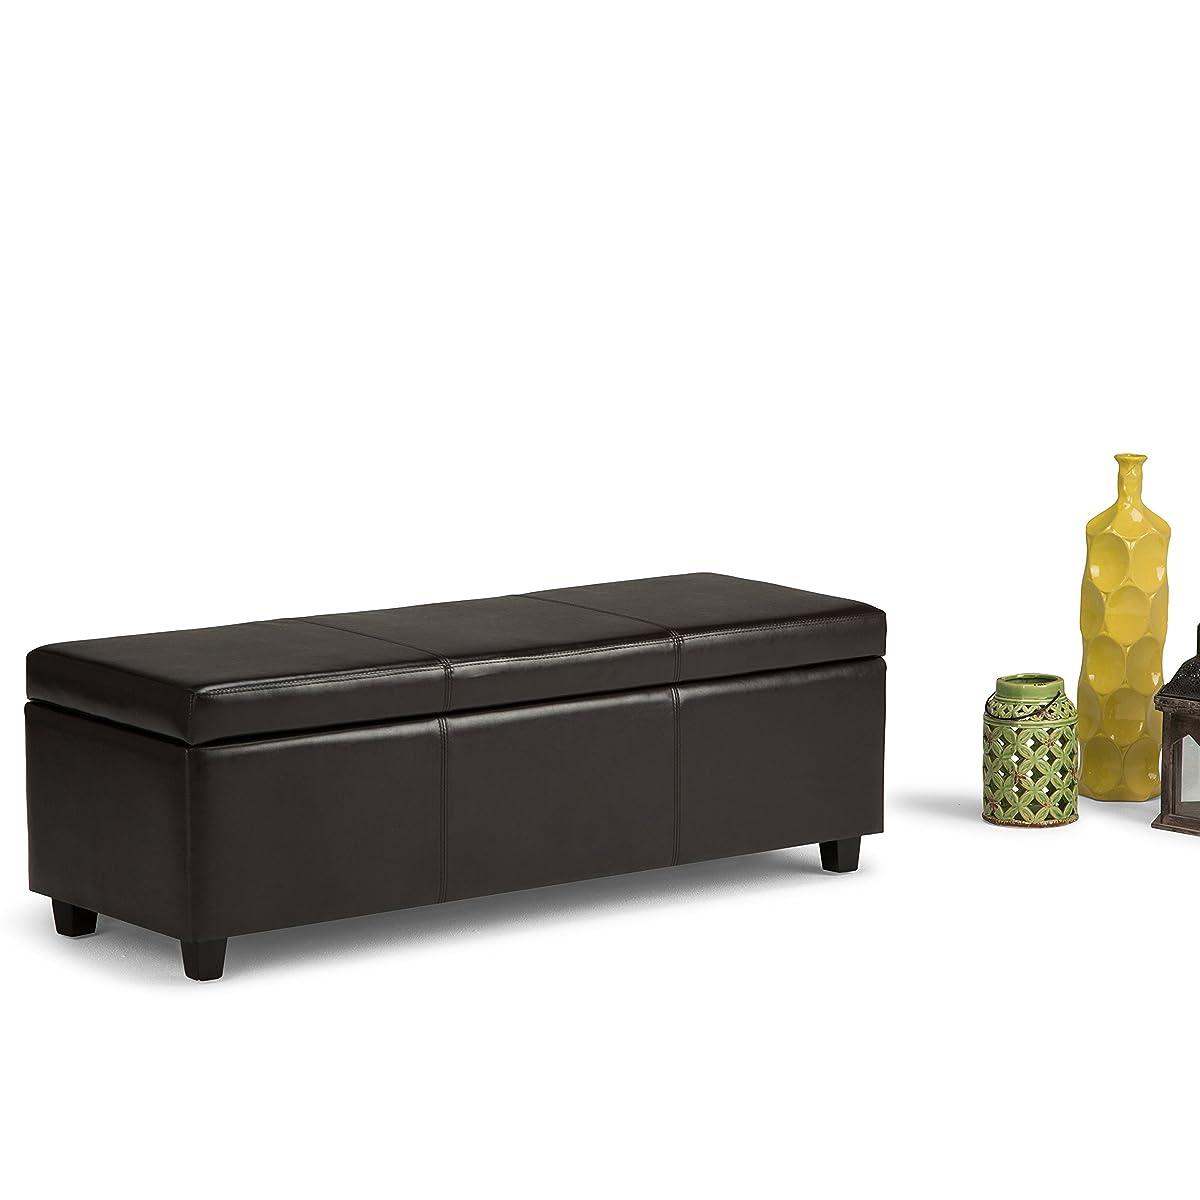 Simpli Home Avalon Rectangular Faux Leather Storage Ottoman Bench, Large, Brown